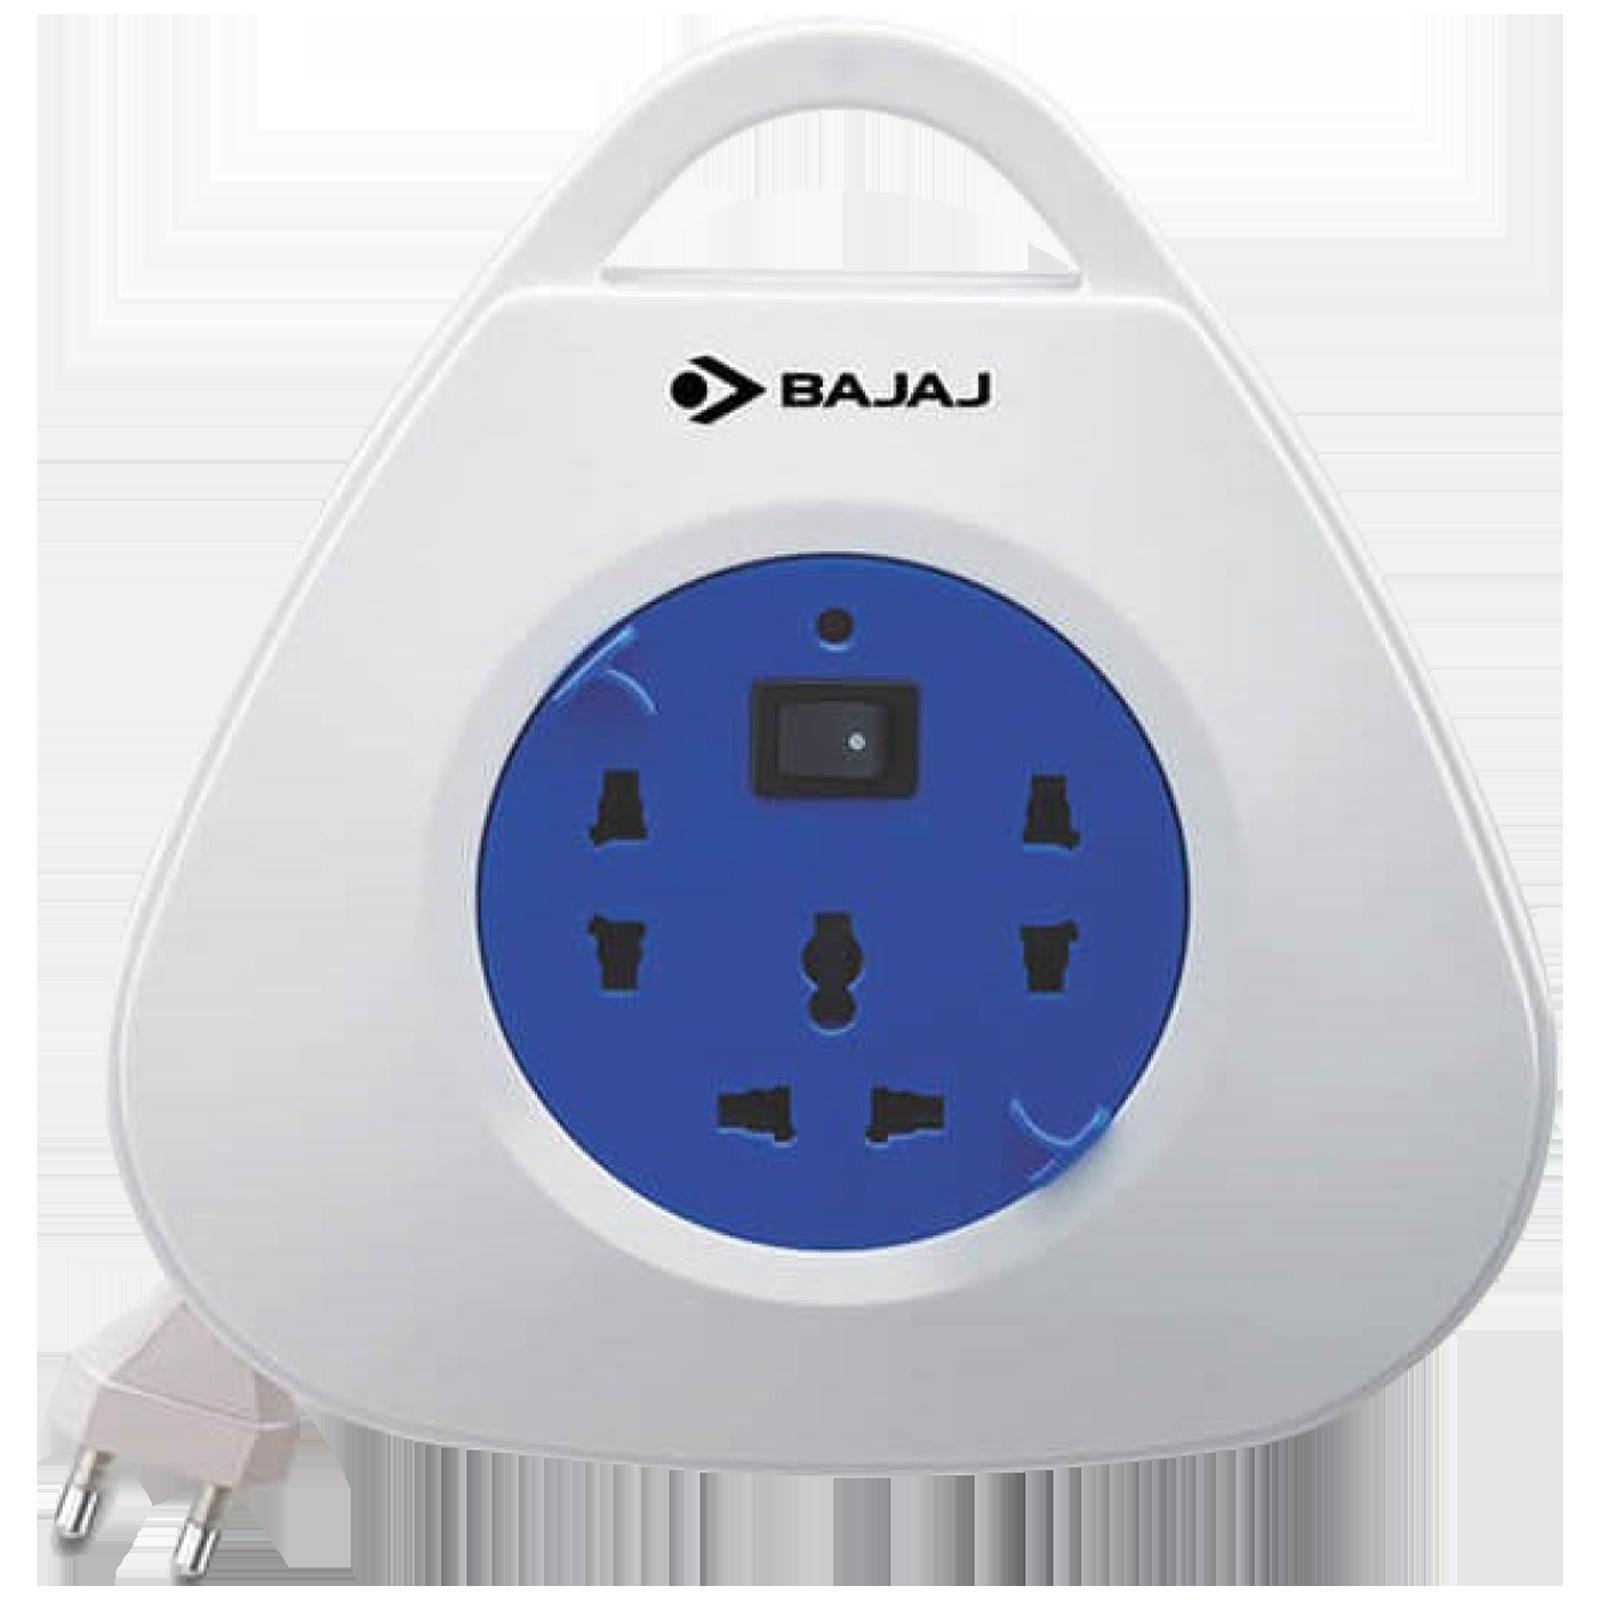 Bajaj Extension Reel 2500 Amps 3 Sockets Extension Board (5 Meters, Resettable Circuit Breaker, 11003, White)_1